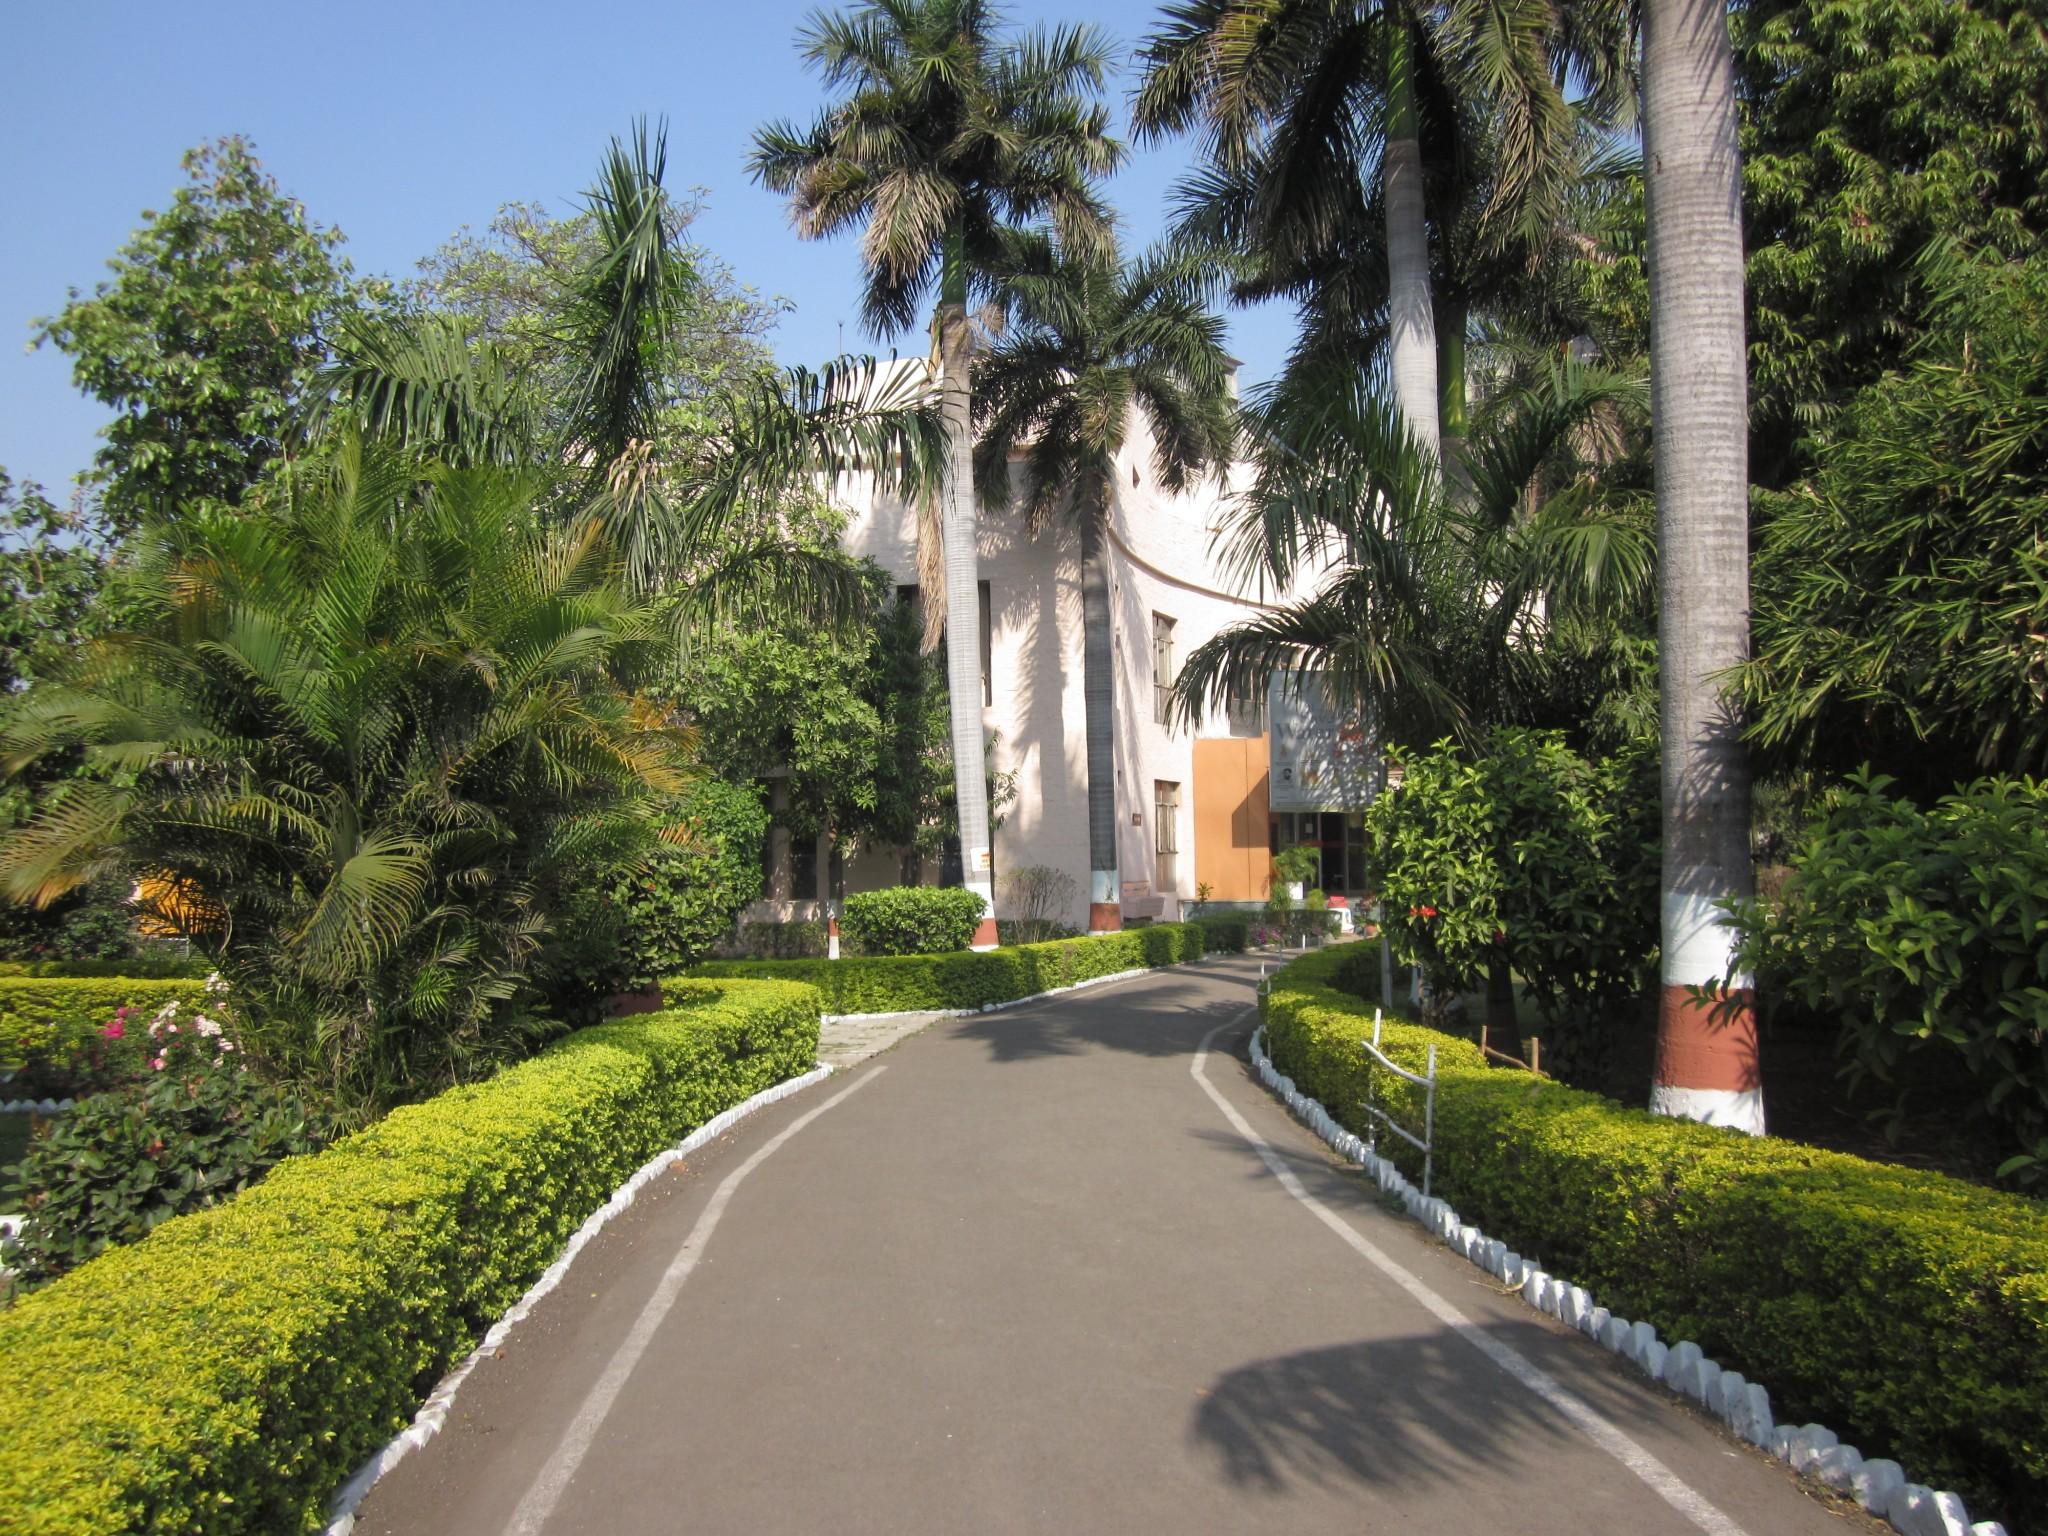 Raman Science Centre - Nagpur Image